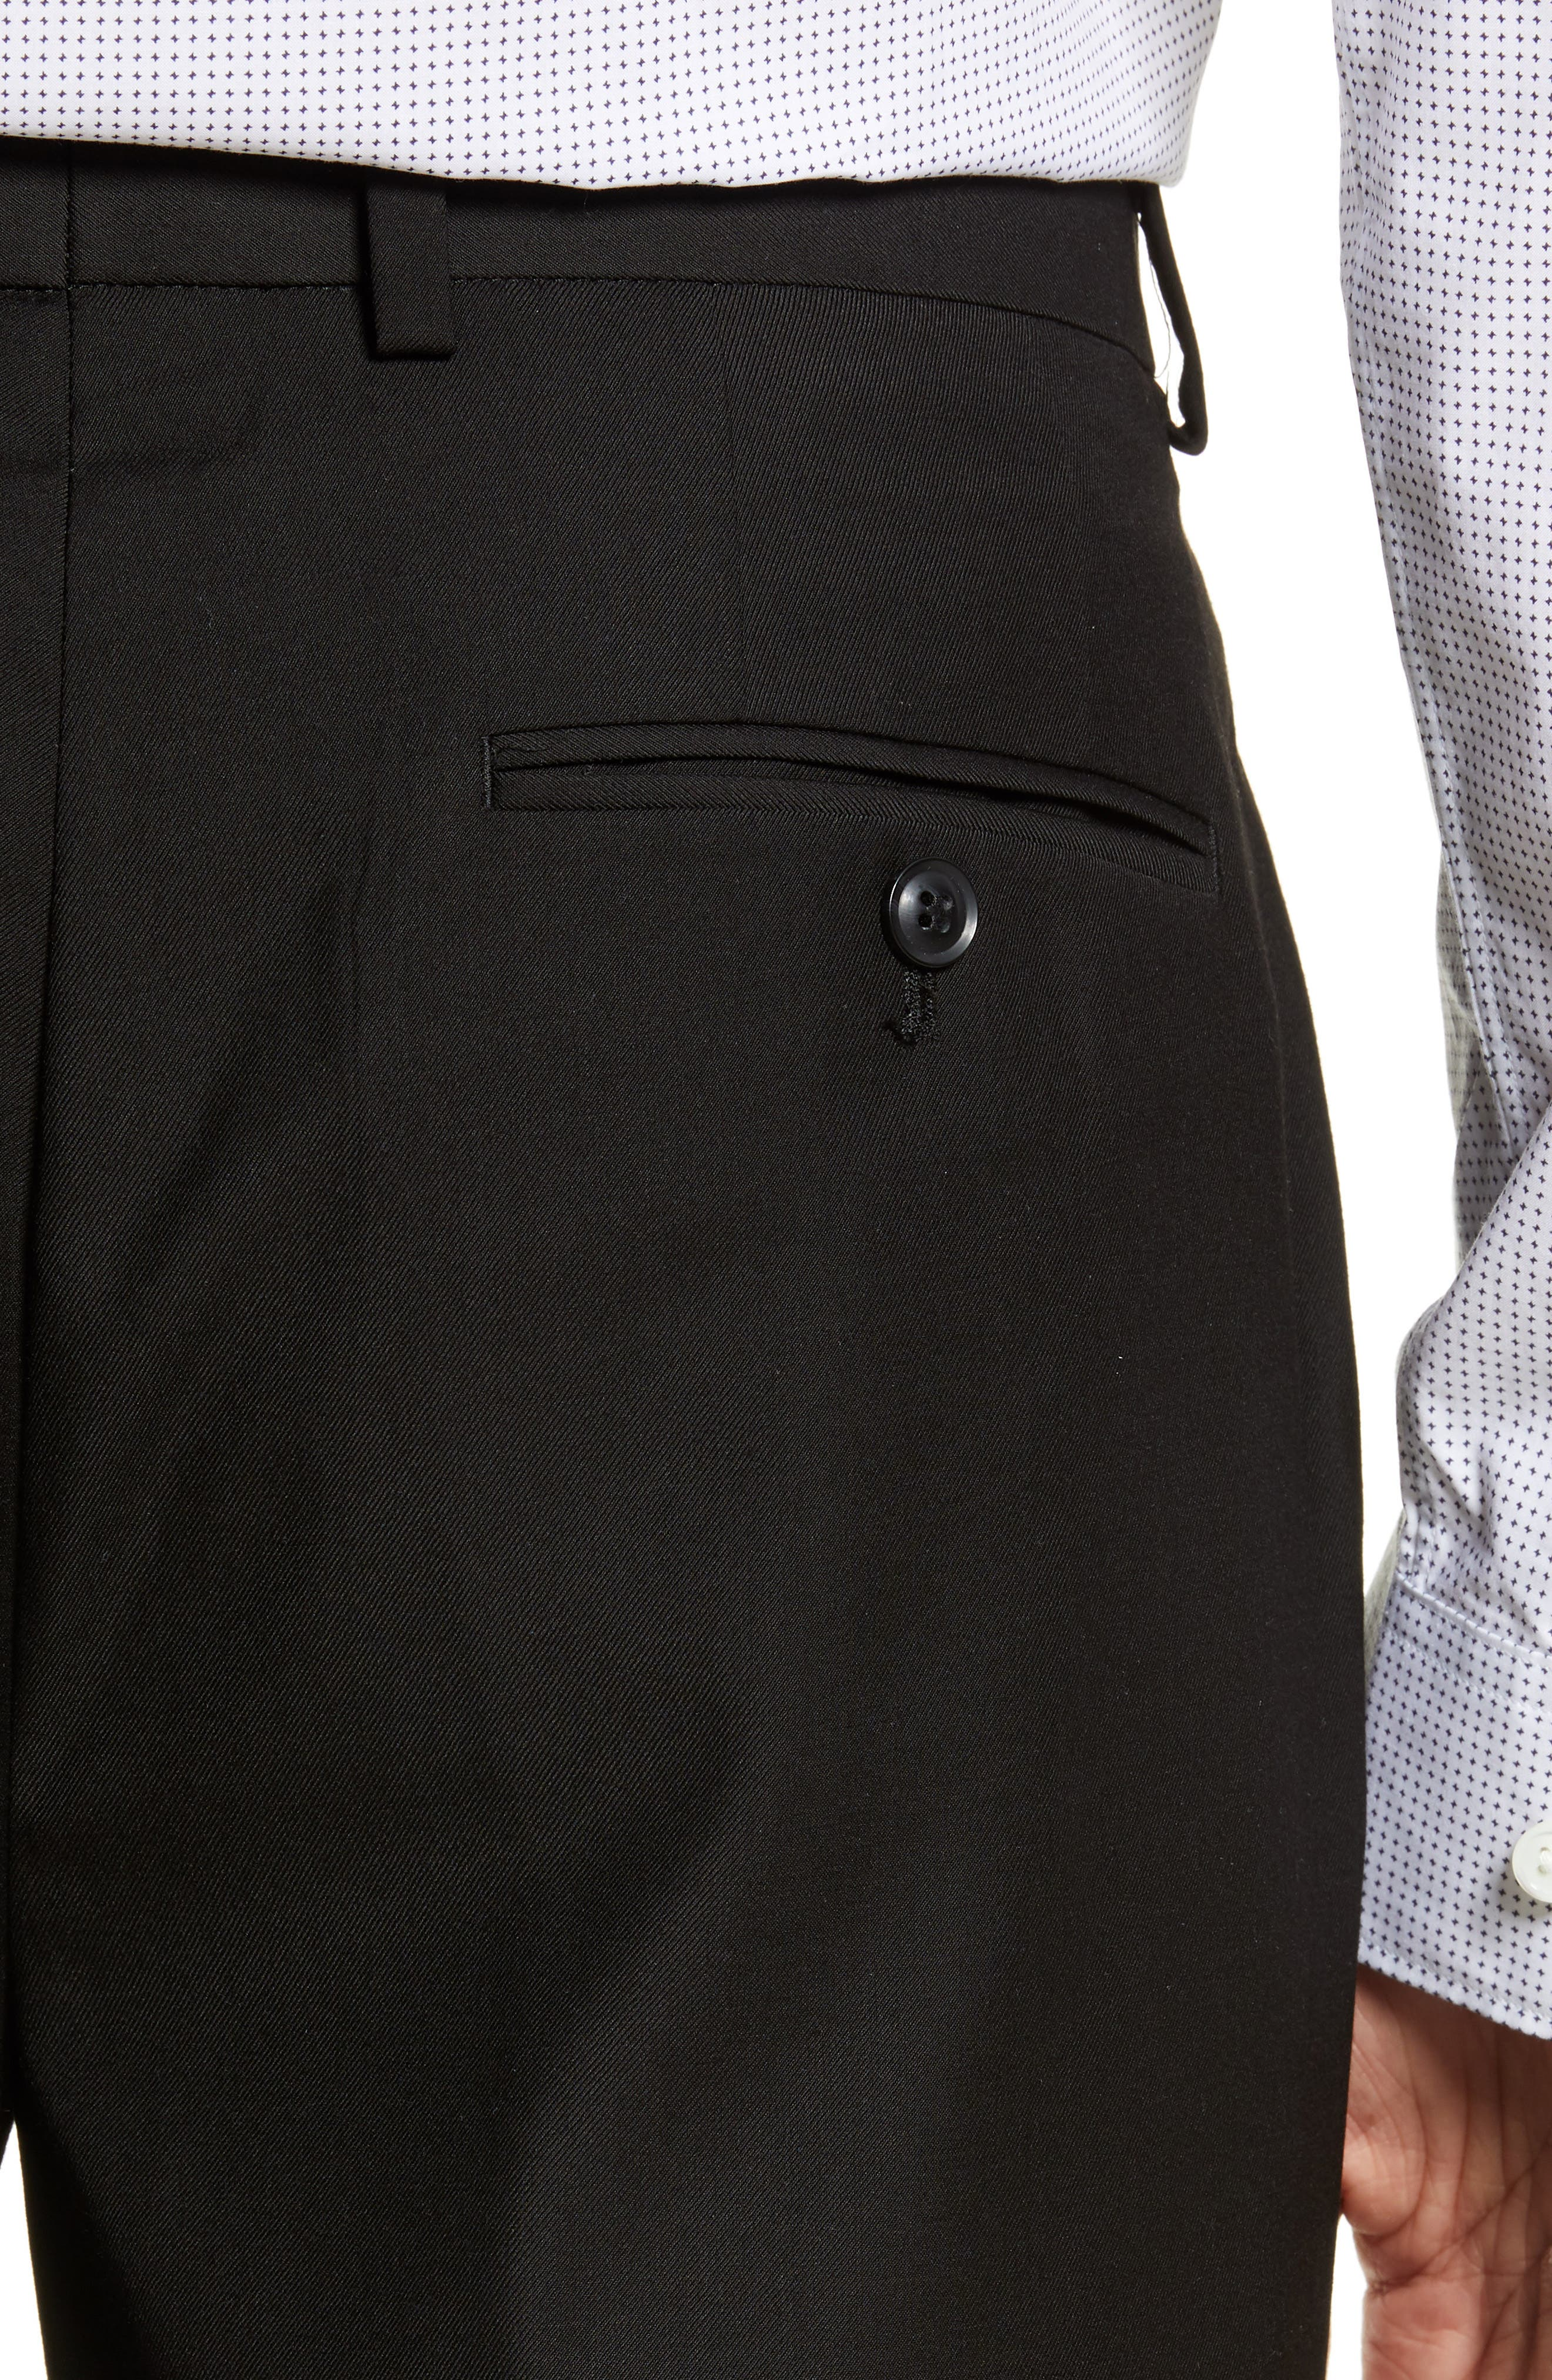 TOPMAN, Black Skinny Fit Trousers, Alternate thumbnail 5, color, BLACK